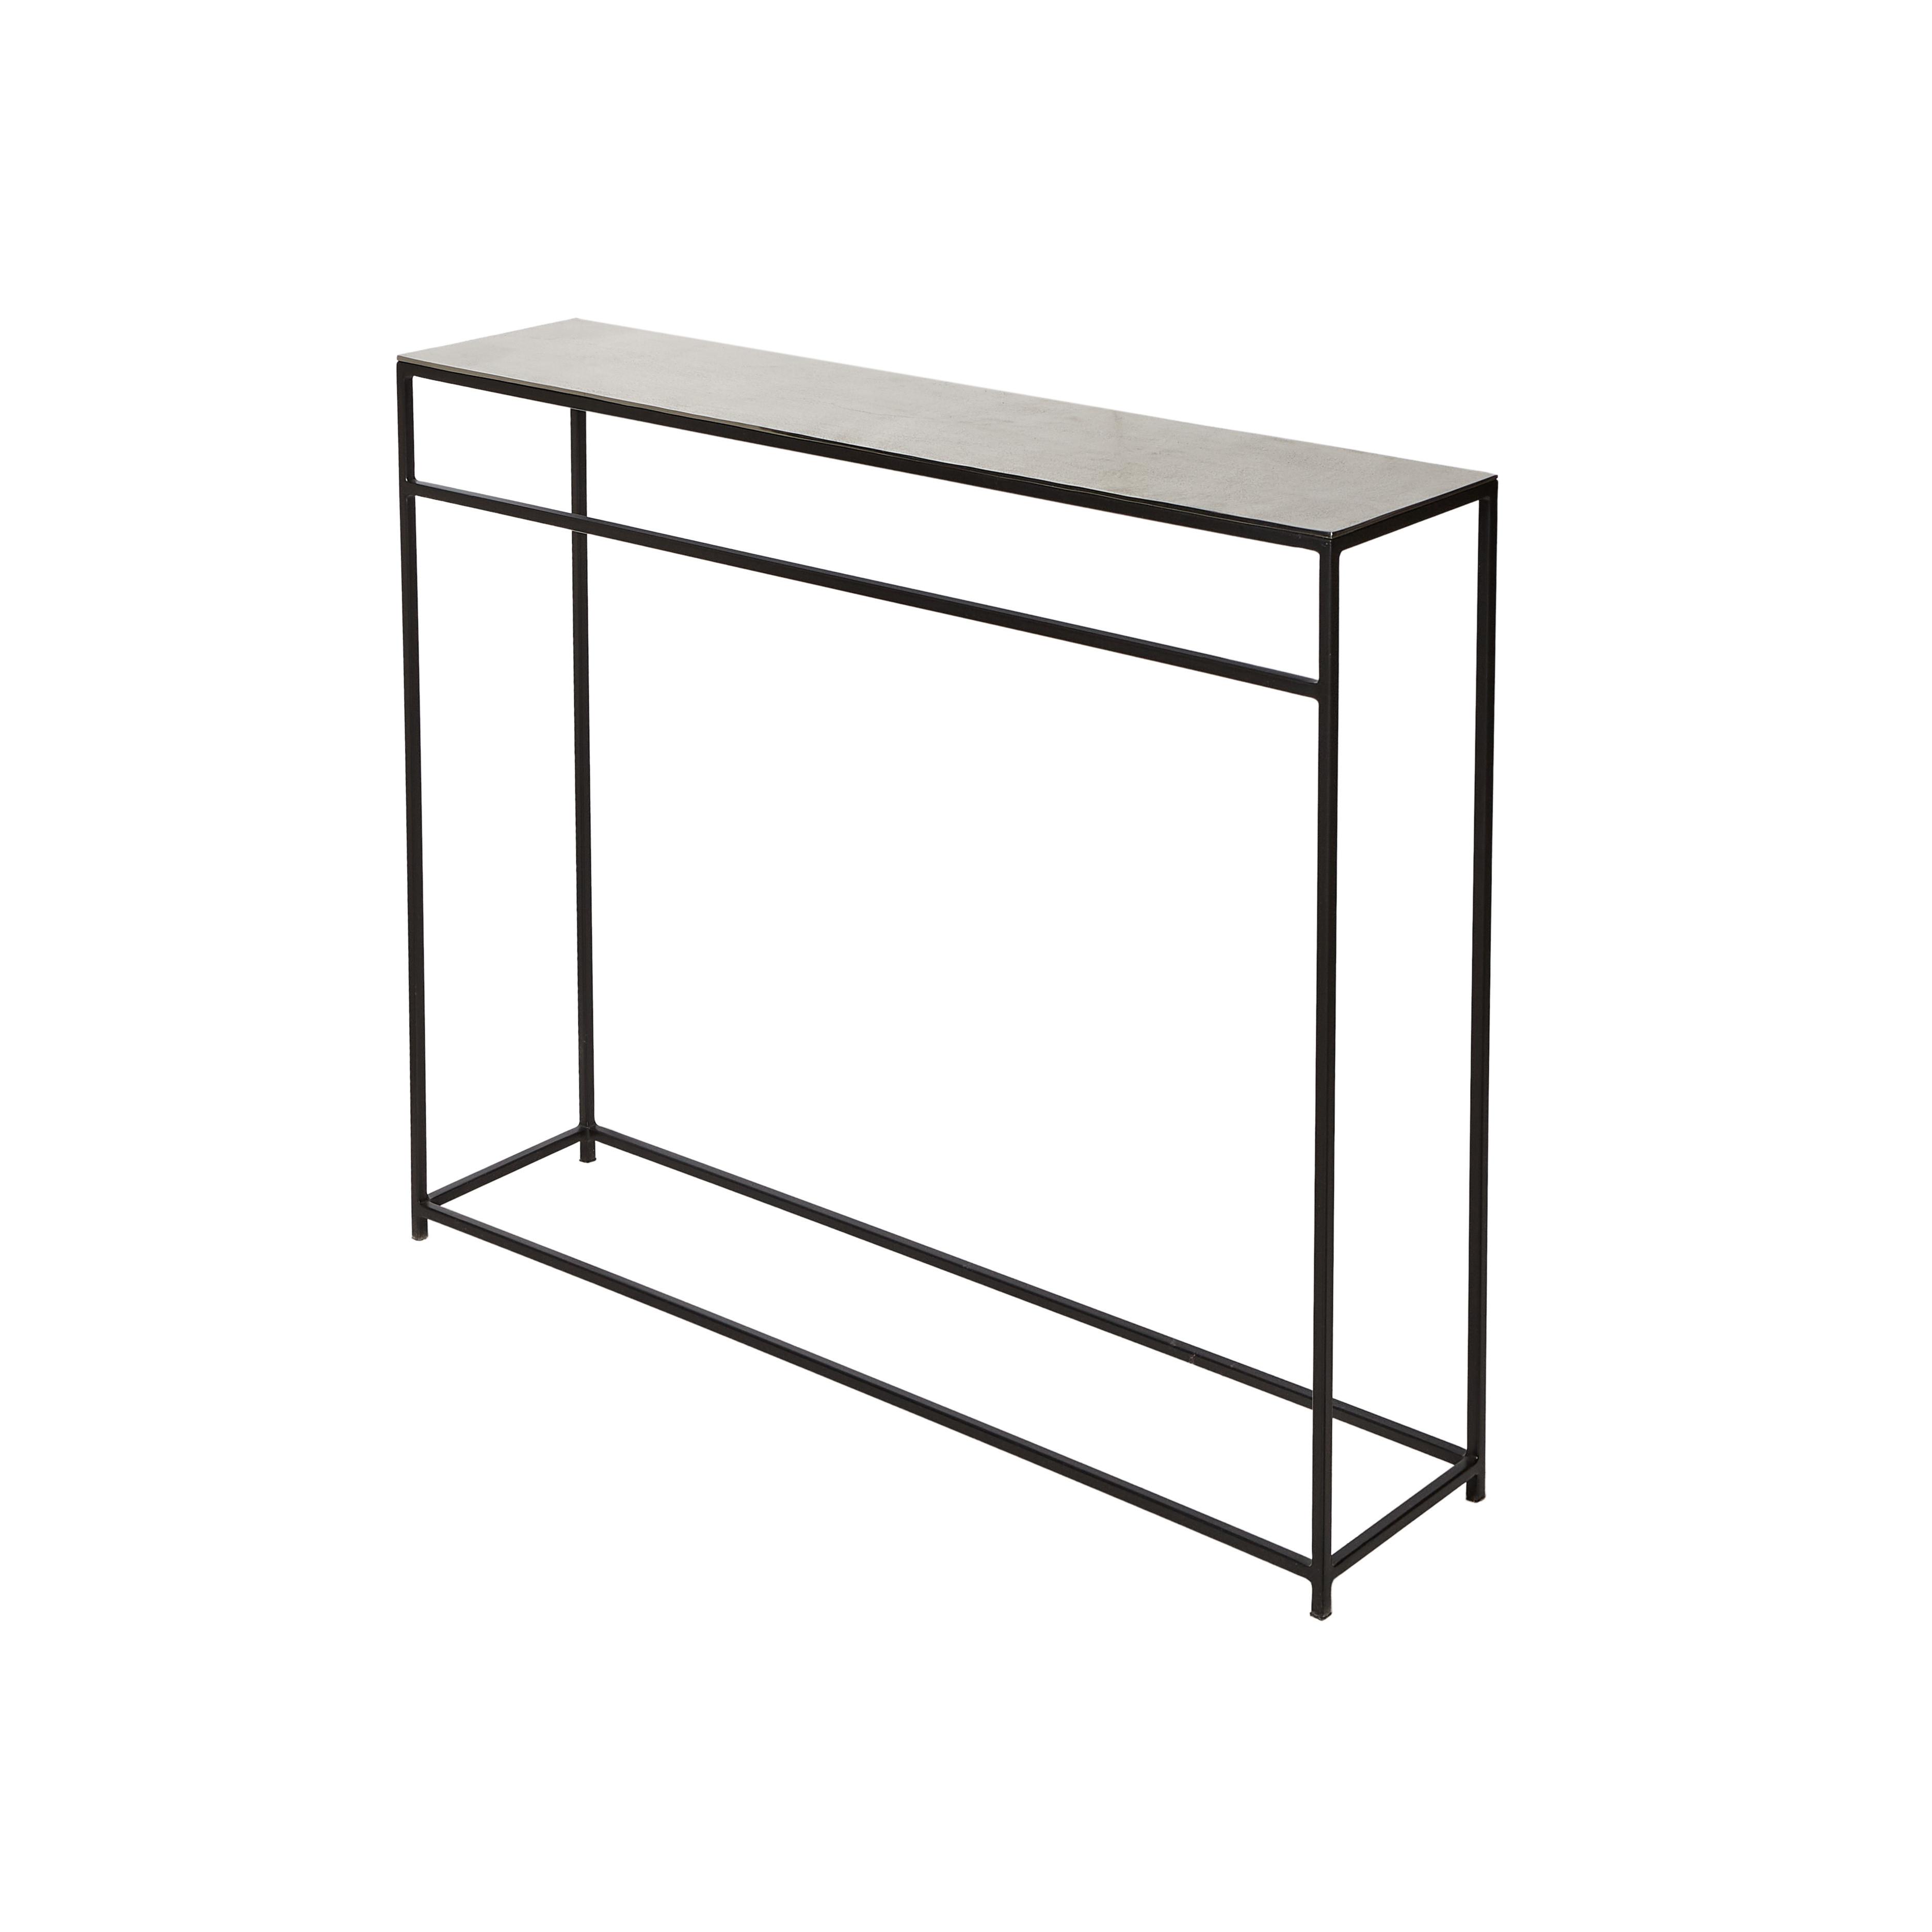 Consolle in alluminio e ferro Consuelo, Grigio argento, large image number 0